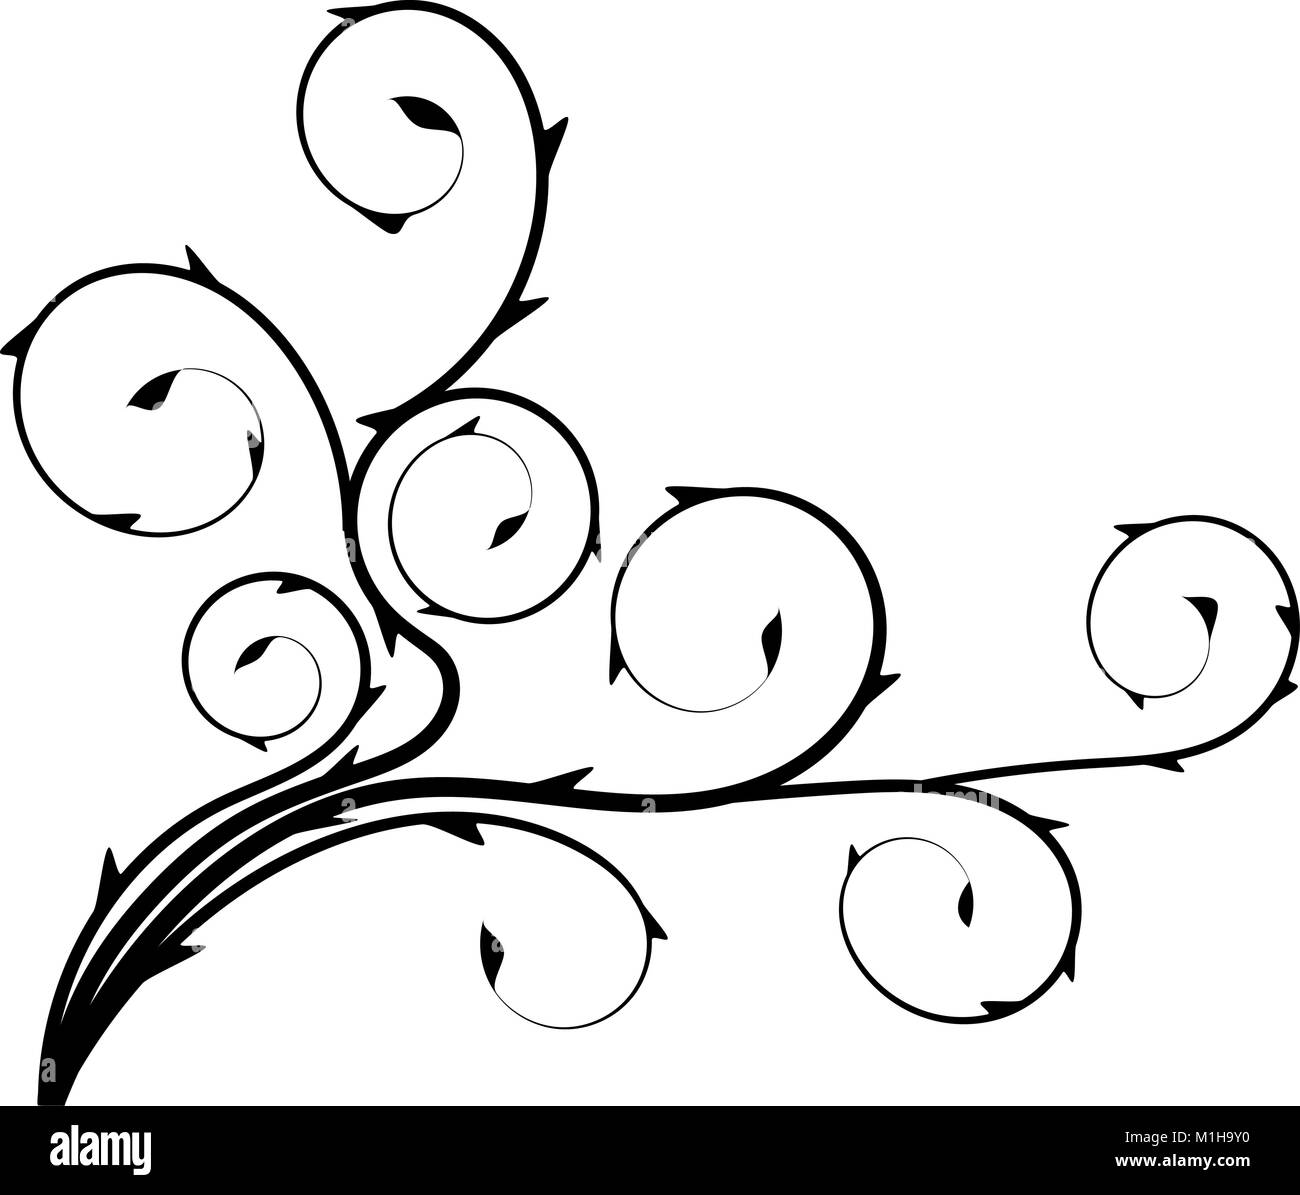 Floral pattern black white - Stock Image